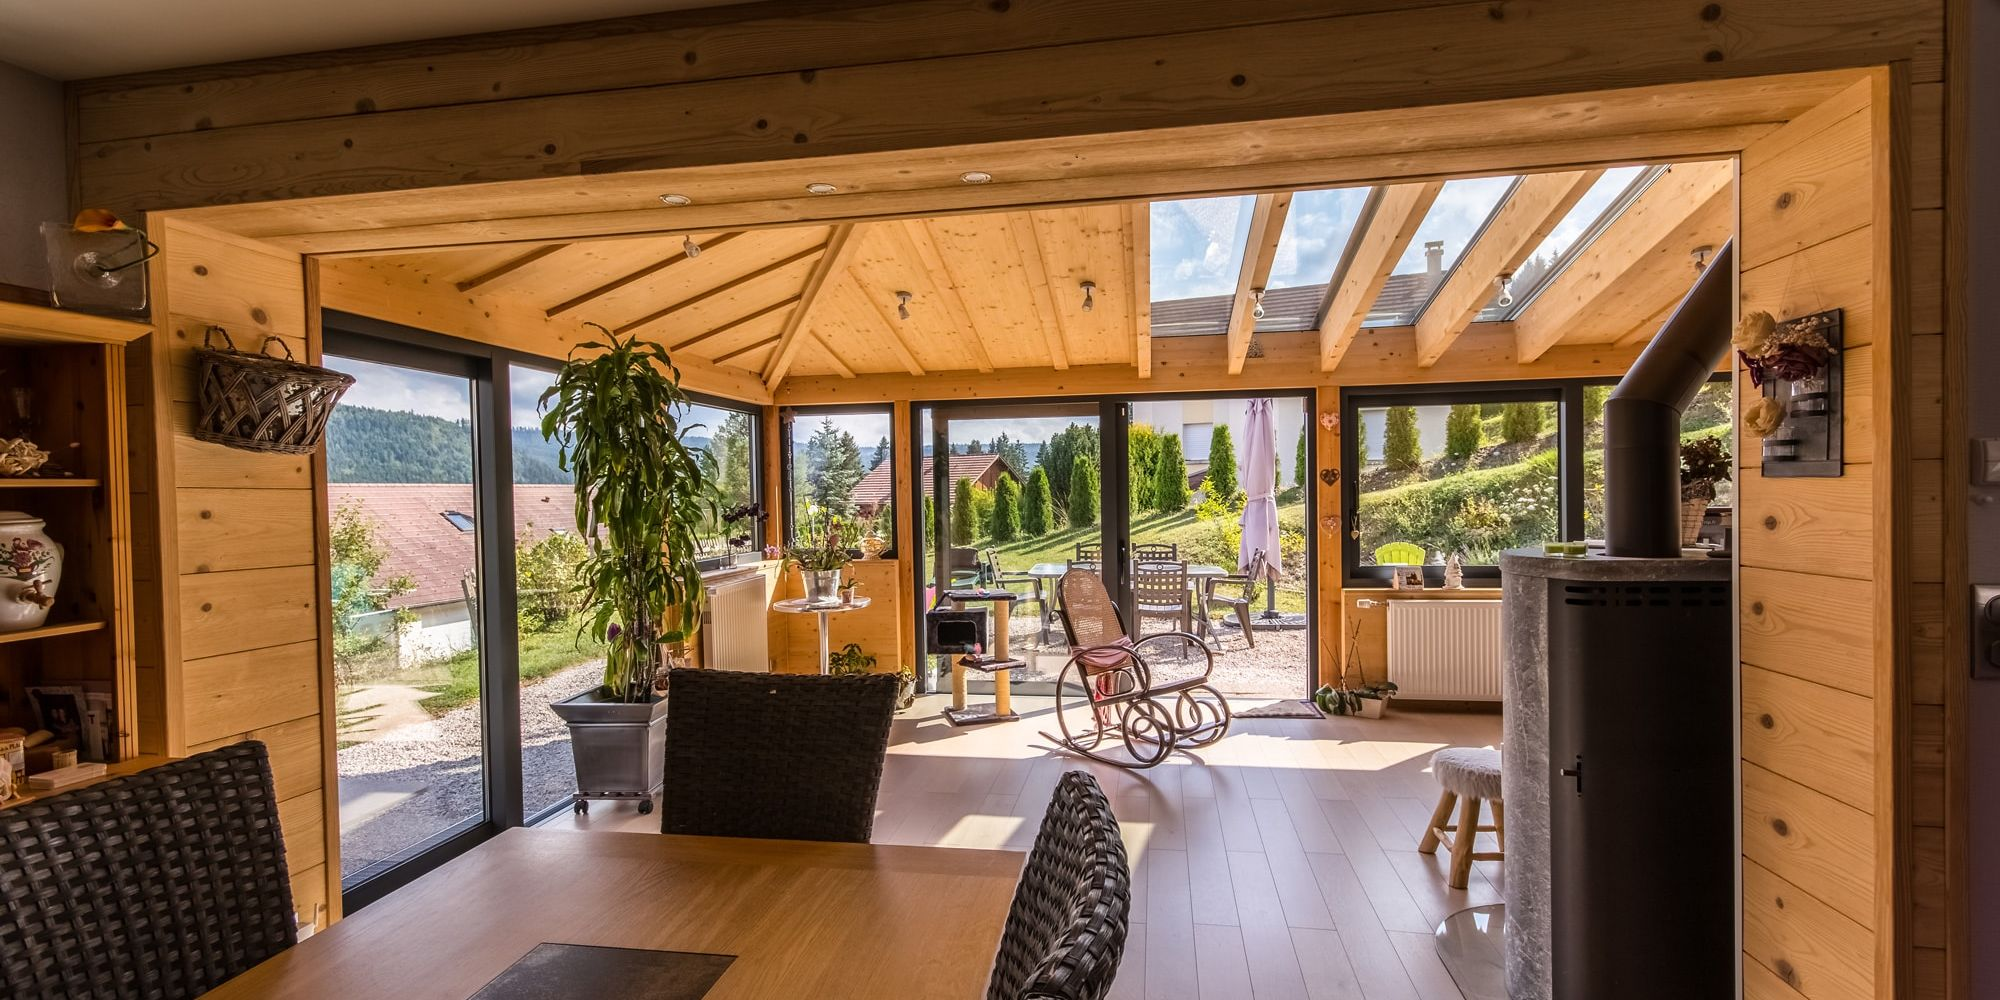 Véranda bois alu et rénovation : Véranda Rêve Doubs, Franche-comté